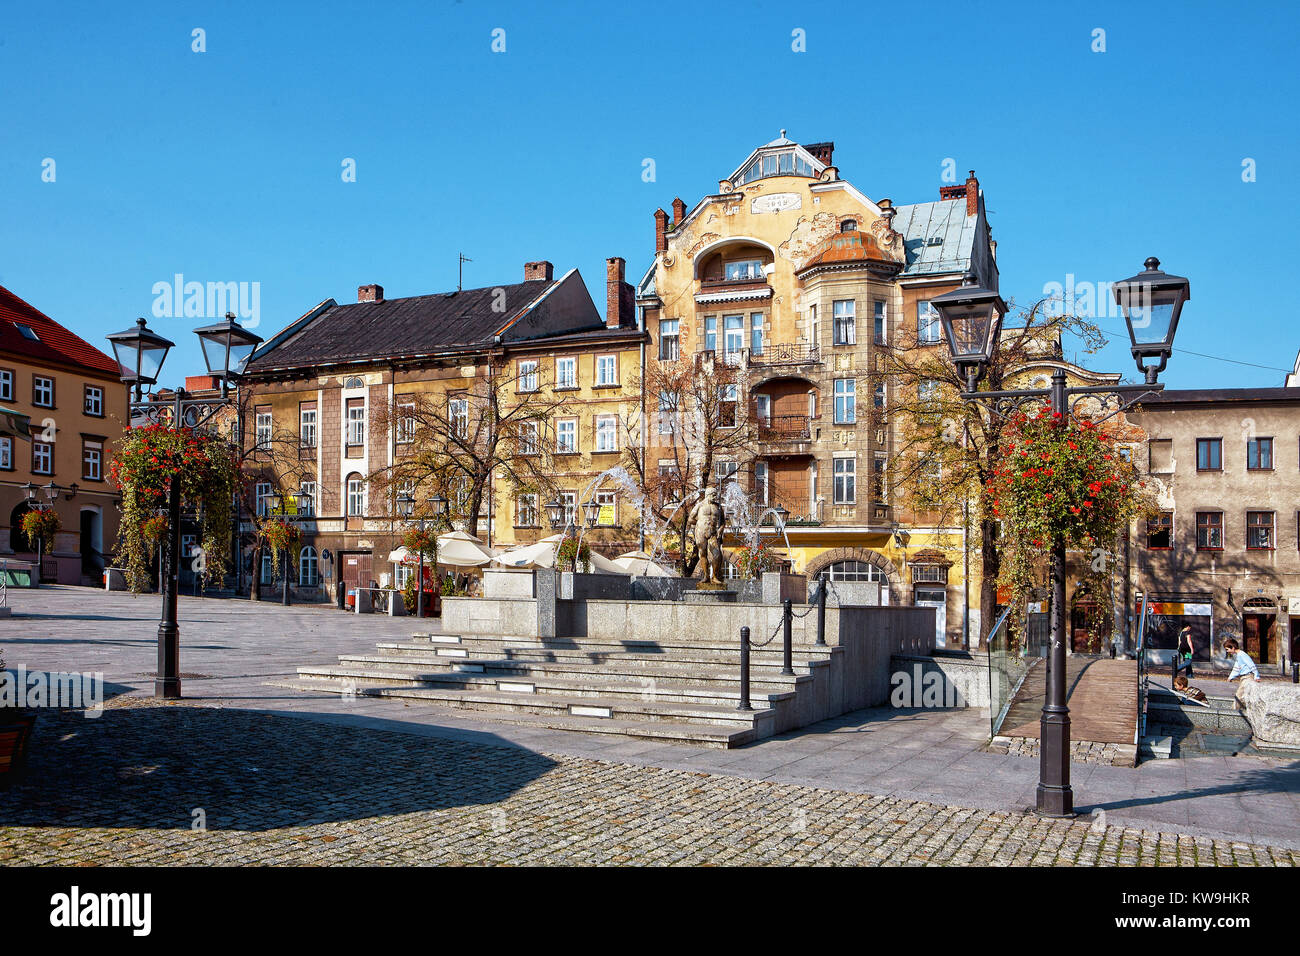 Poland, Bielsko-Biała, market - Stock Image